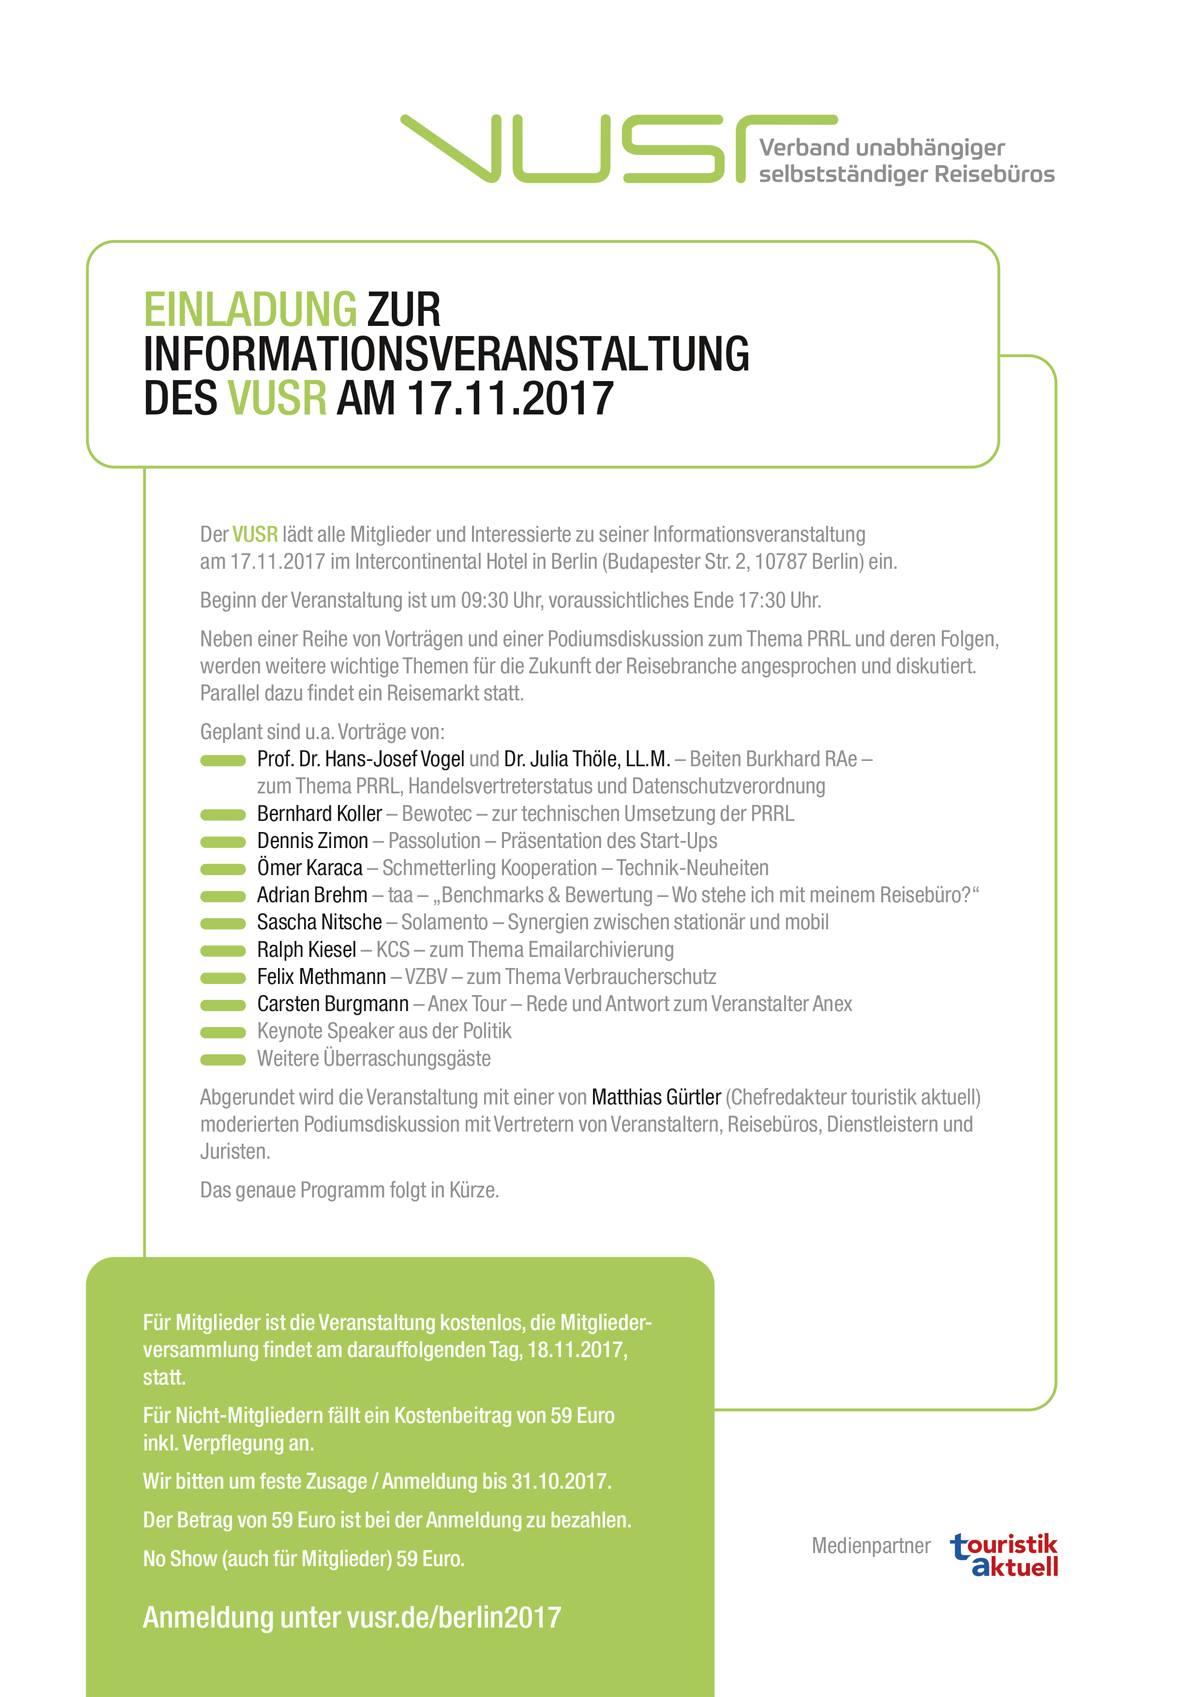 redaktion vusr – verband unabhängiger selbstständiger reisebüros e.v., Einladung